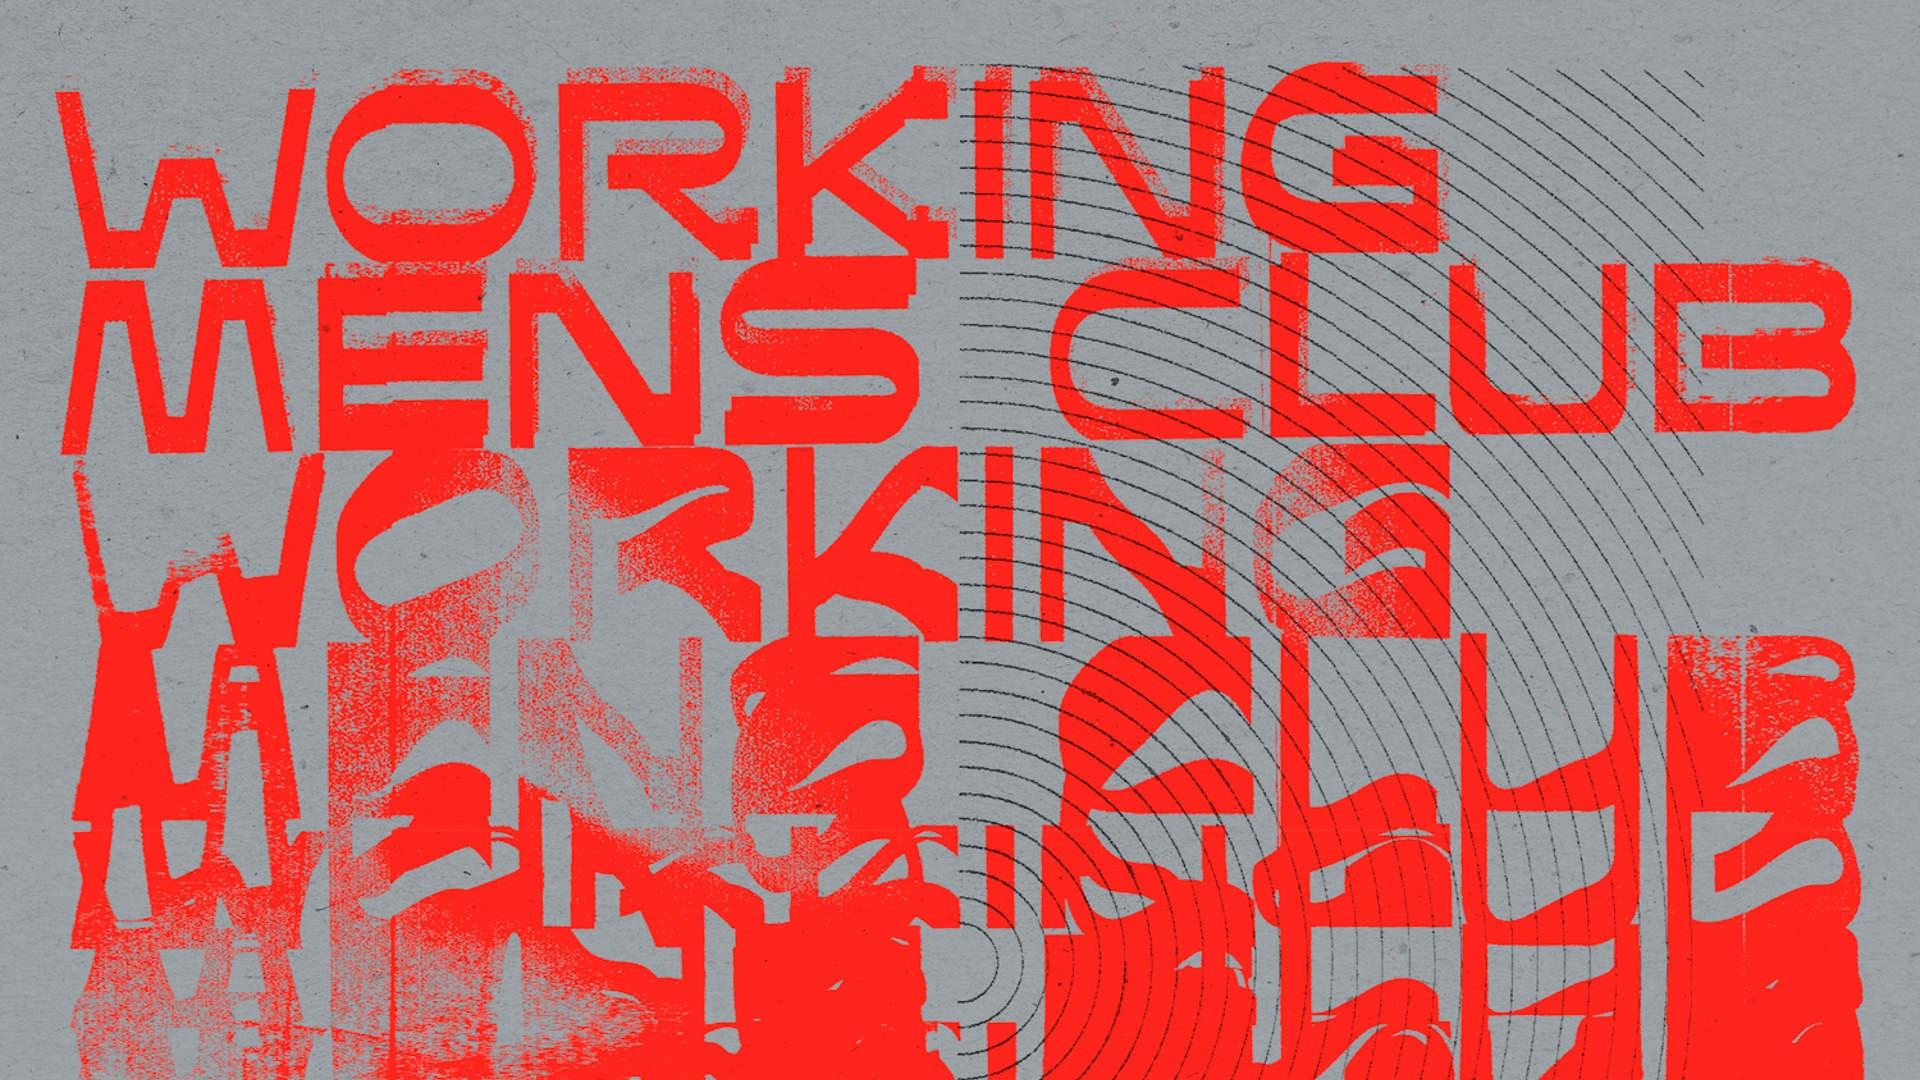 Working Men's Club